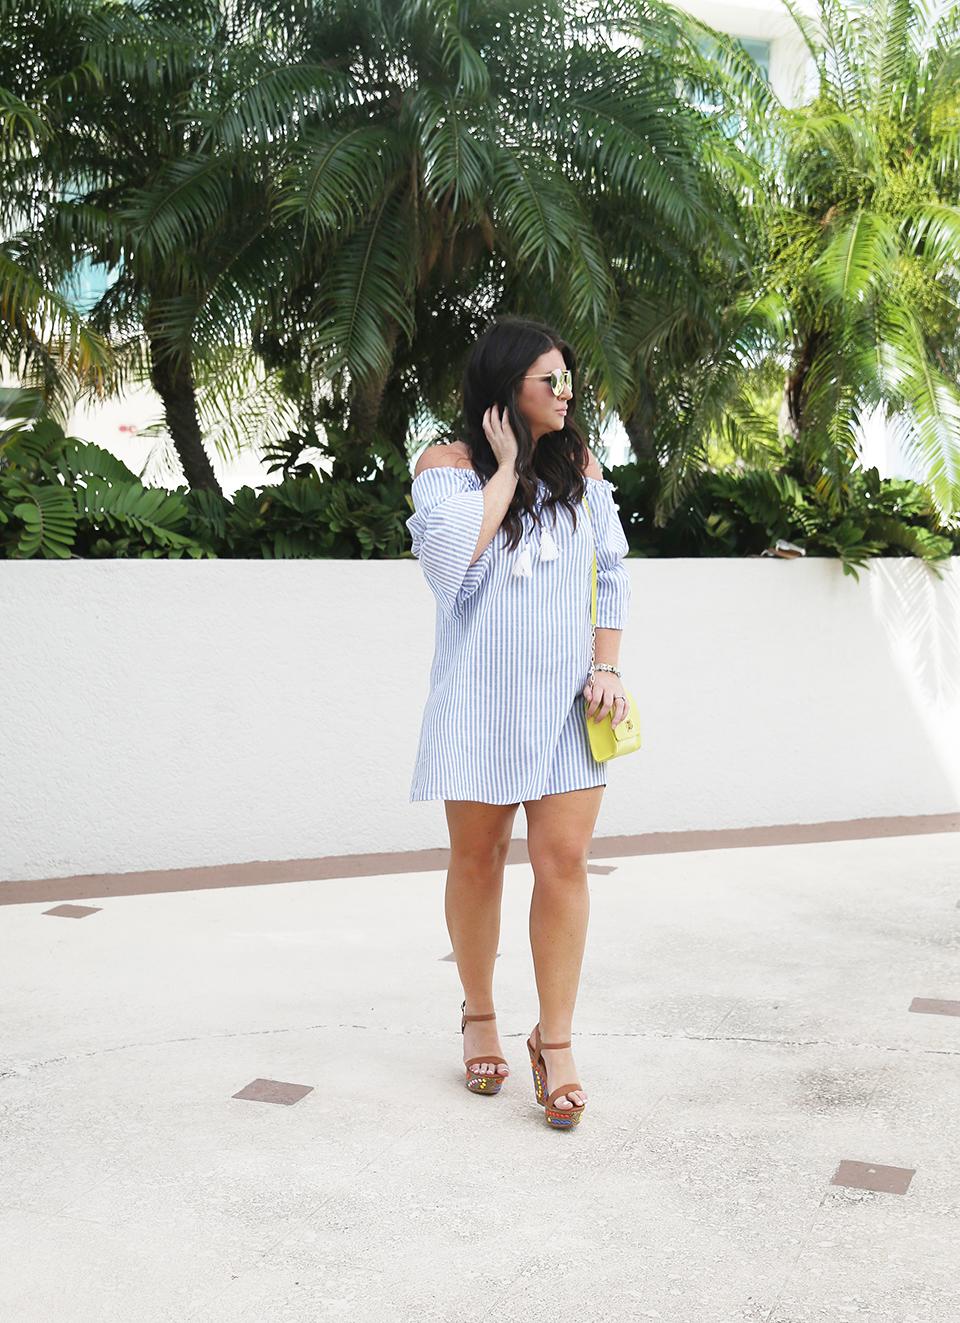 Sonesta Miami 30A Street Style Morning Lavender 5345 - Web